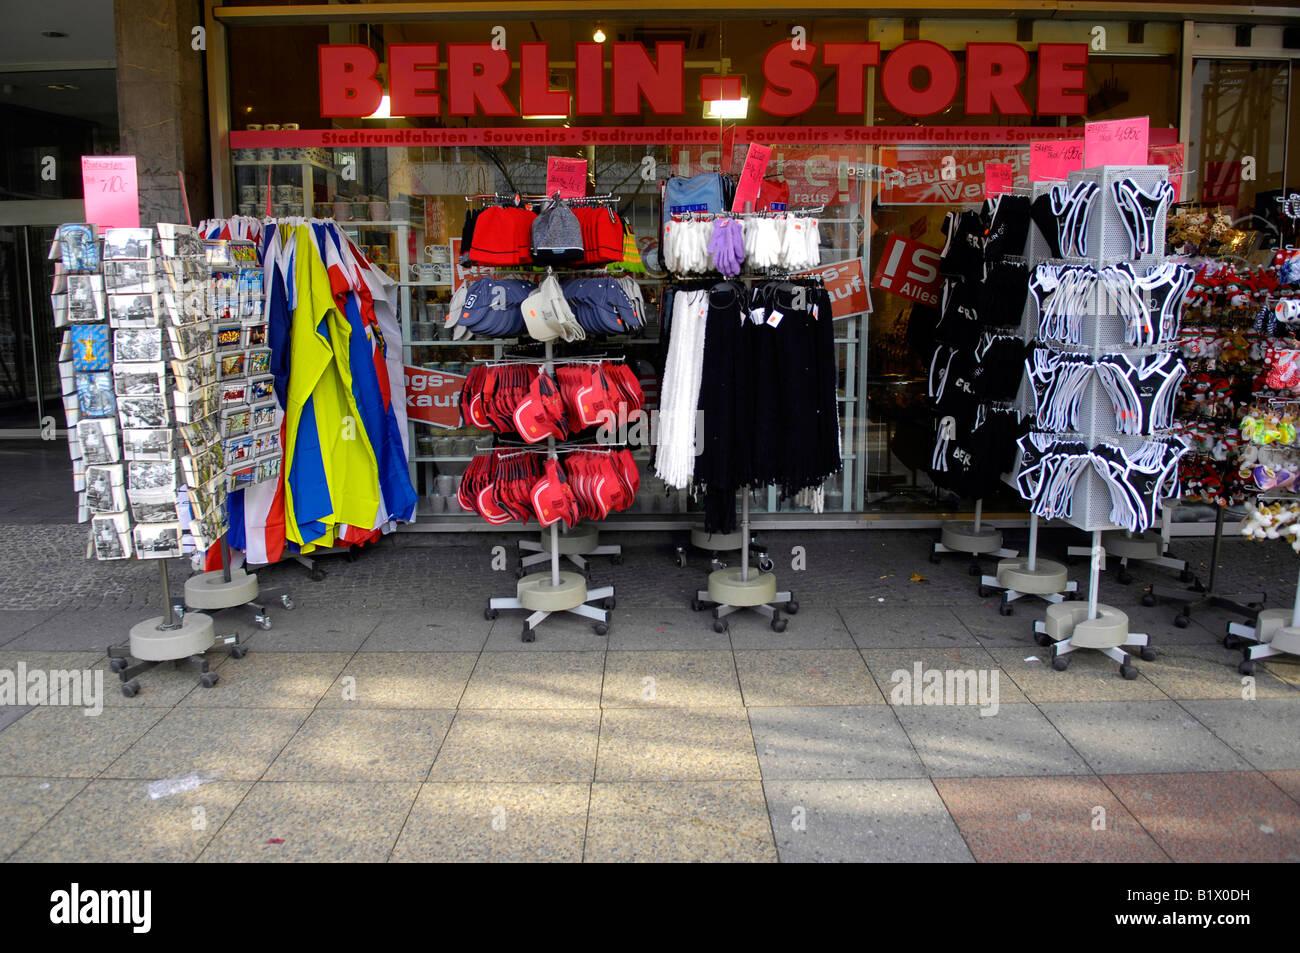 berlin store souvenir germany deutschland shop consumerism stock photo royalty free image. Black Bedroom Furniture Sets. Home Design Ideas